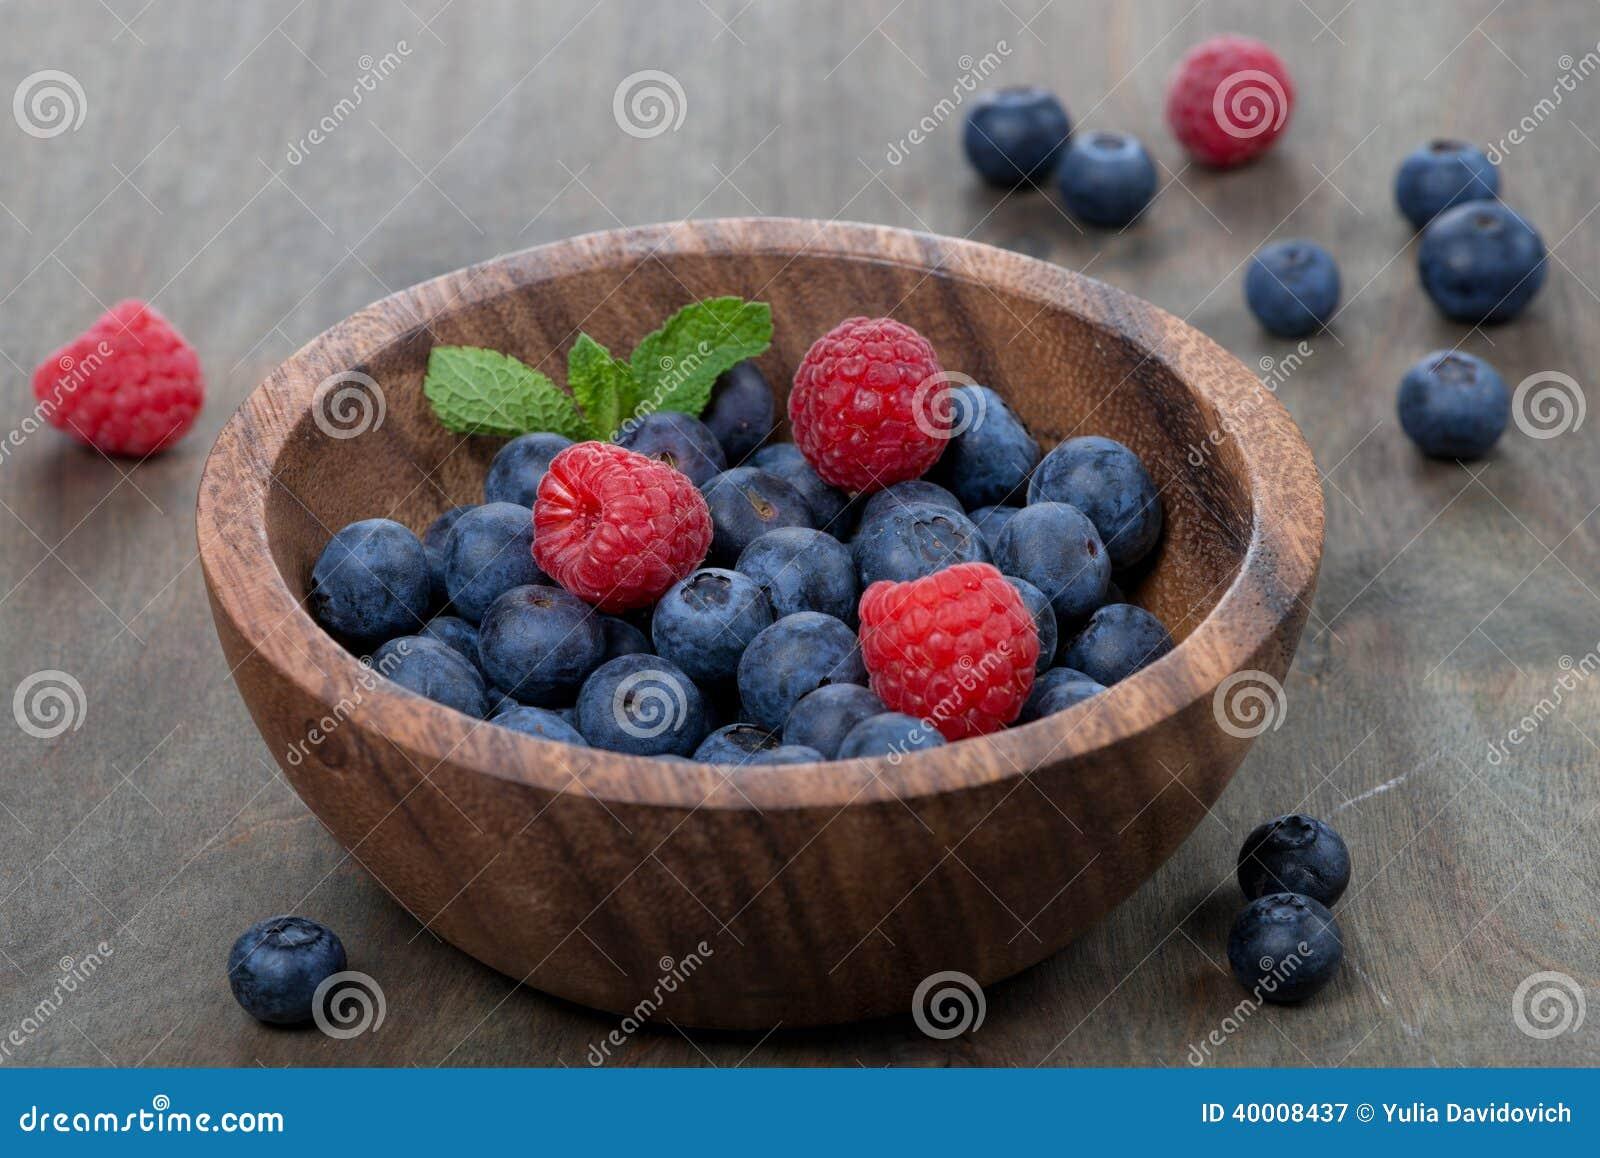 Fresh blueberries and raspberries in wooden bowl